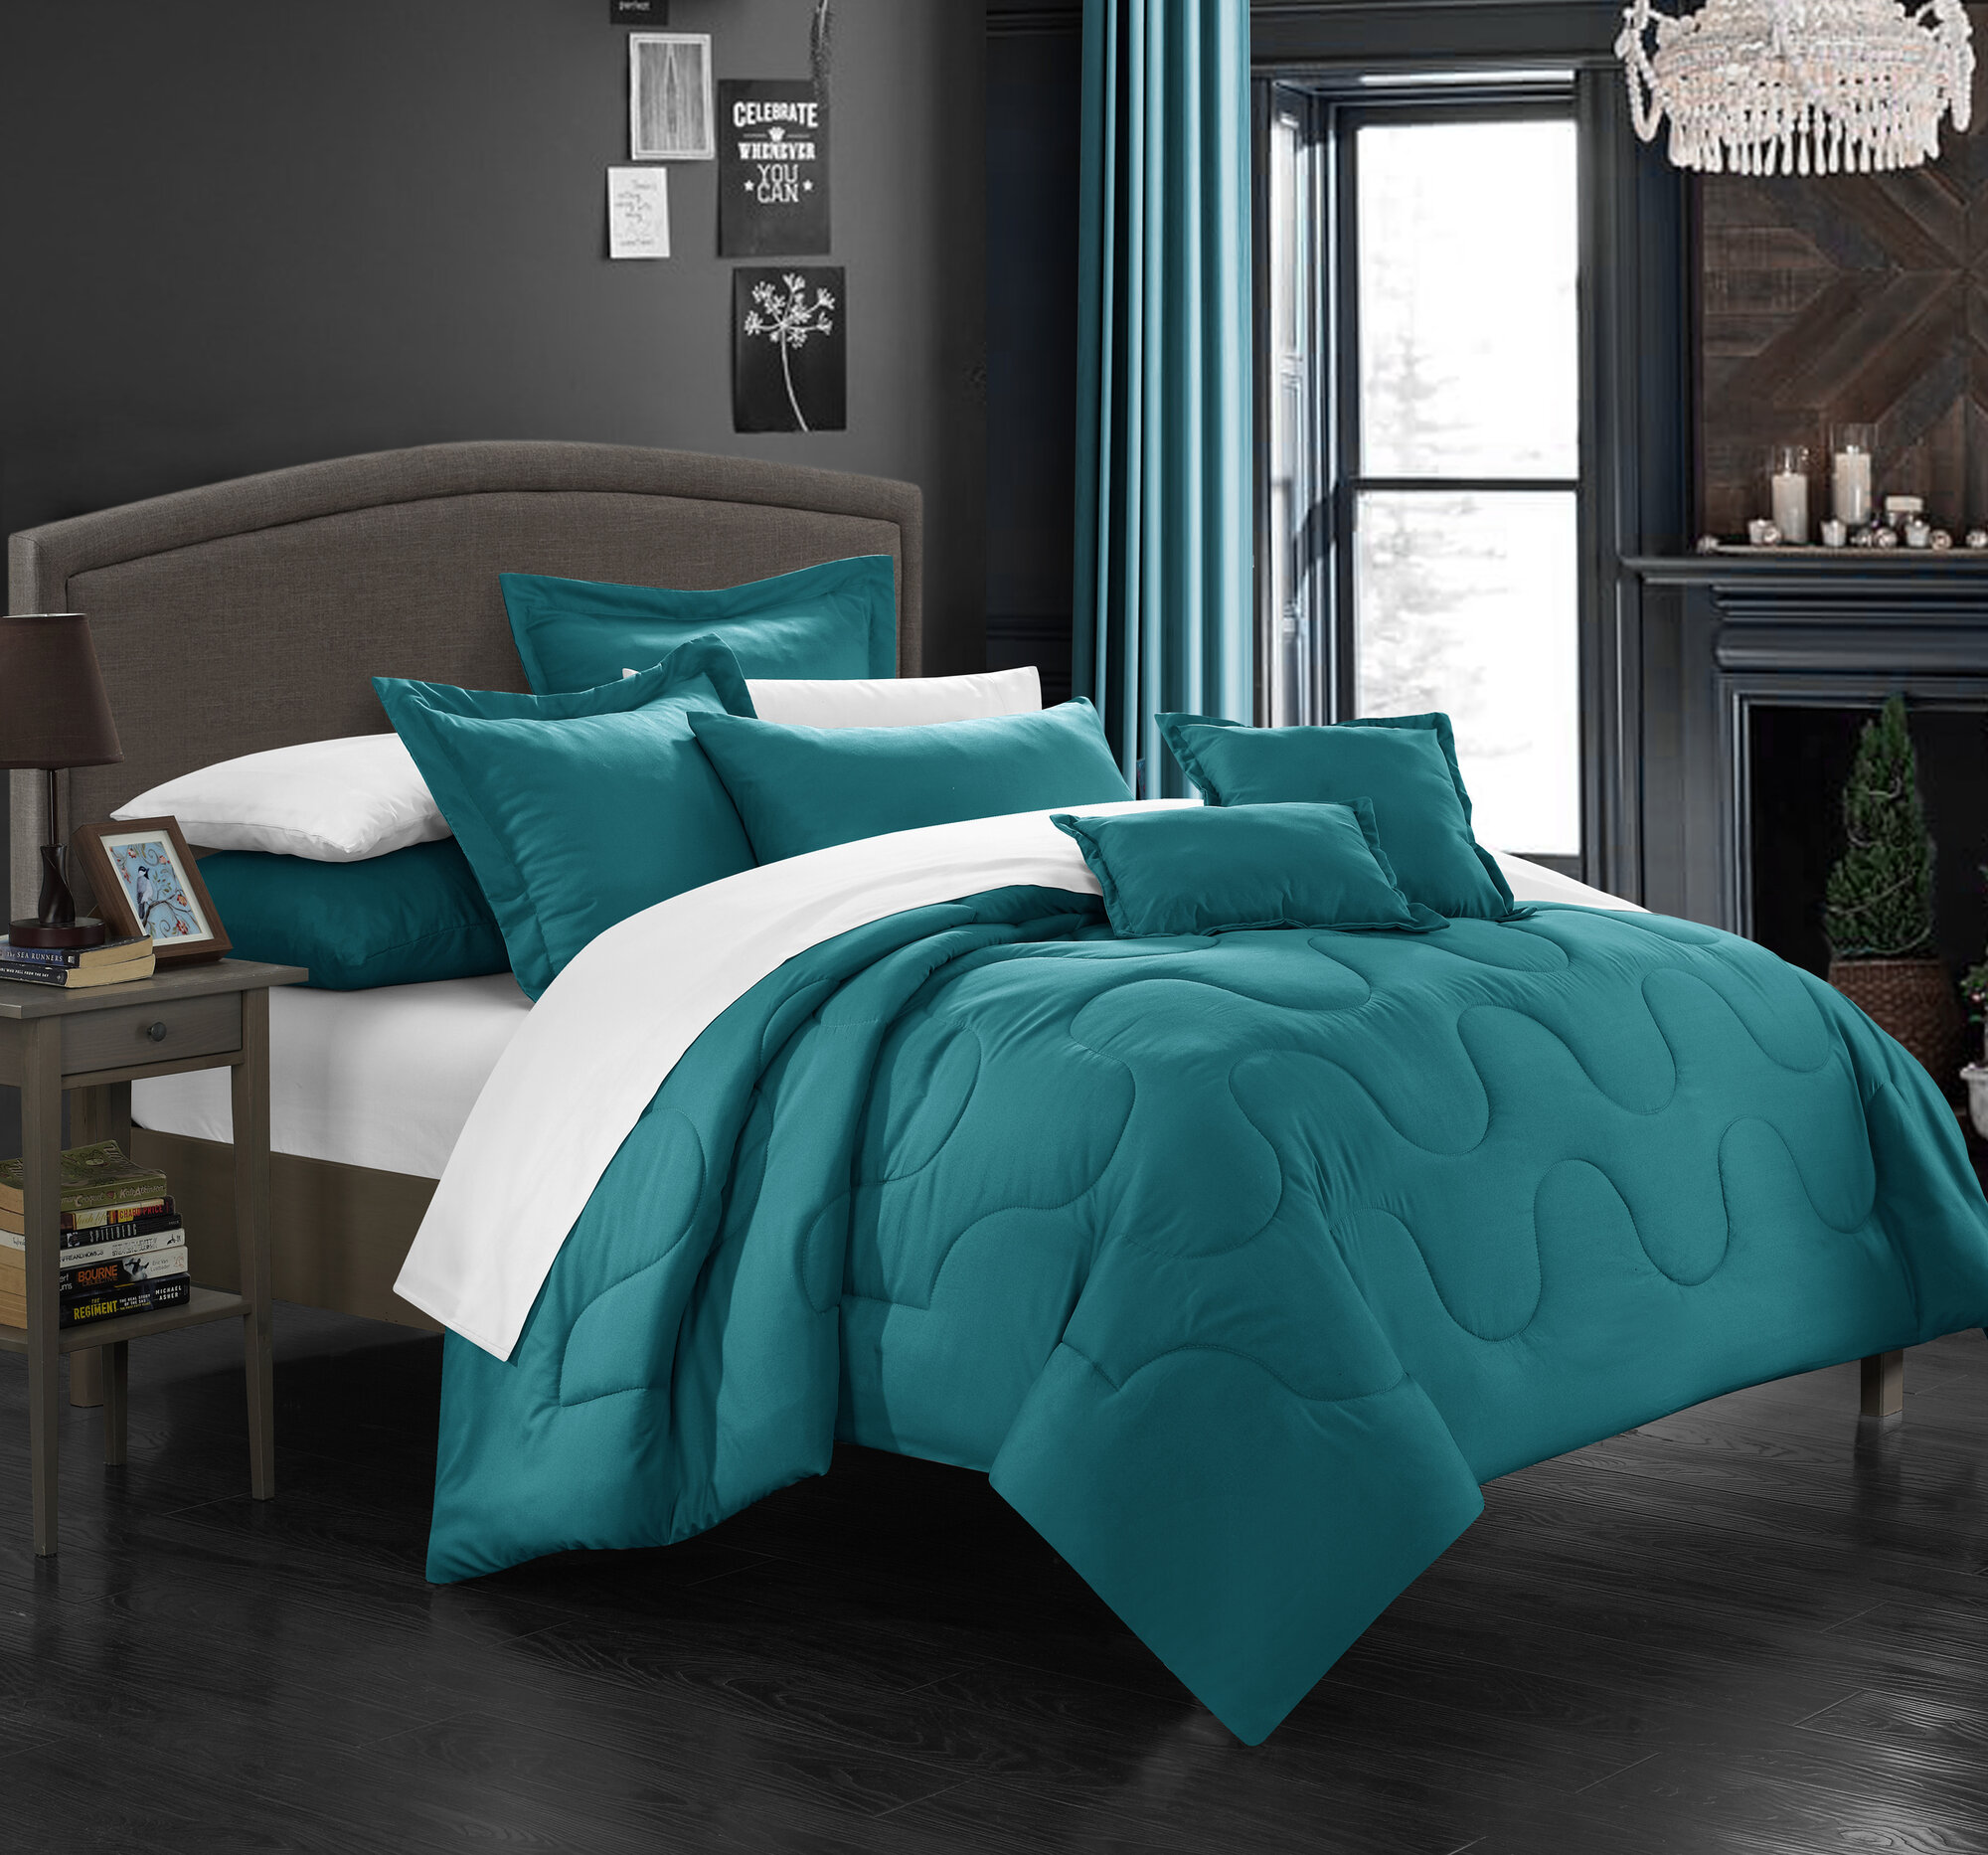 Chic Home Donna Comforter Set Size: King, Color: Teal